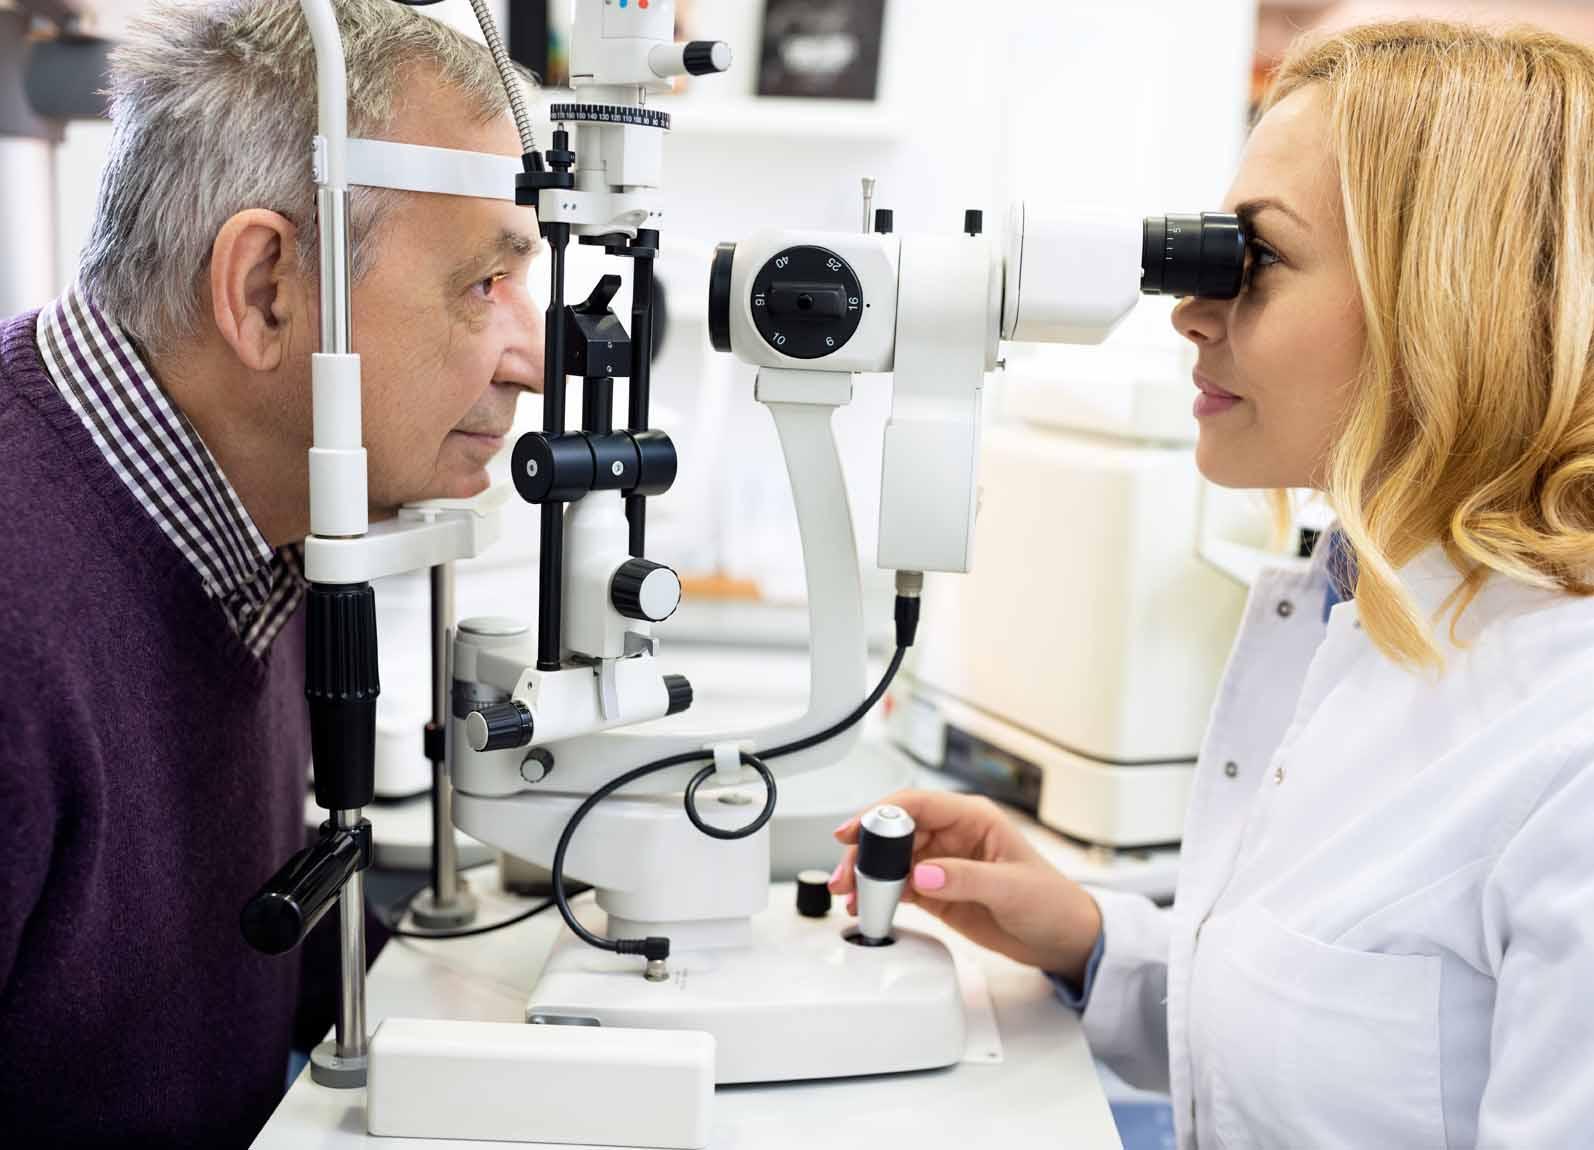 Z:\615-20181006\Final\B Section\B22-26 health\Senior-eye-care.jpg